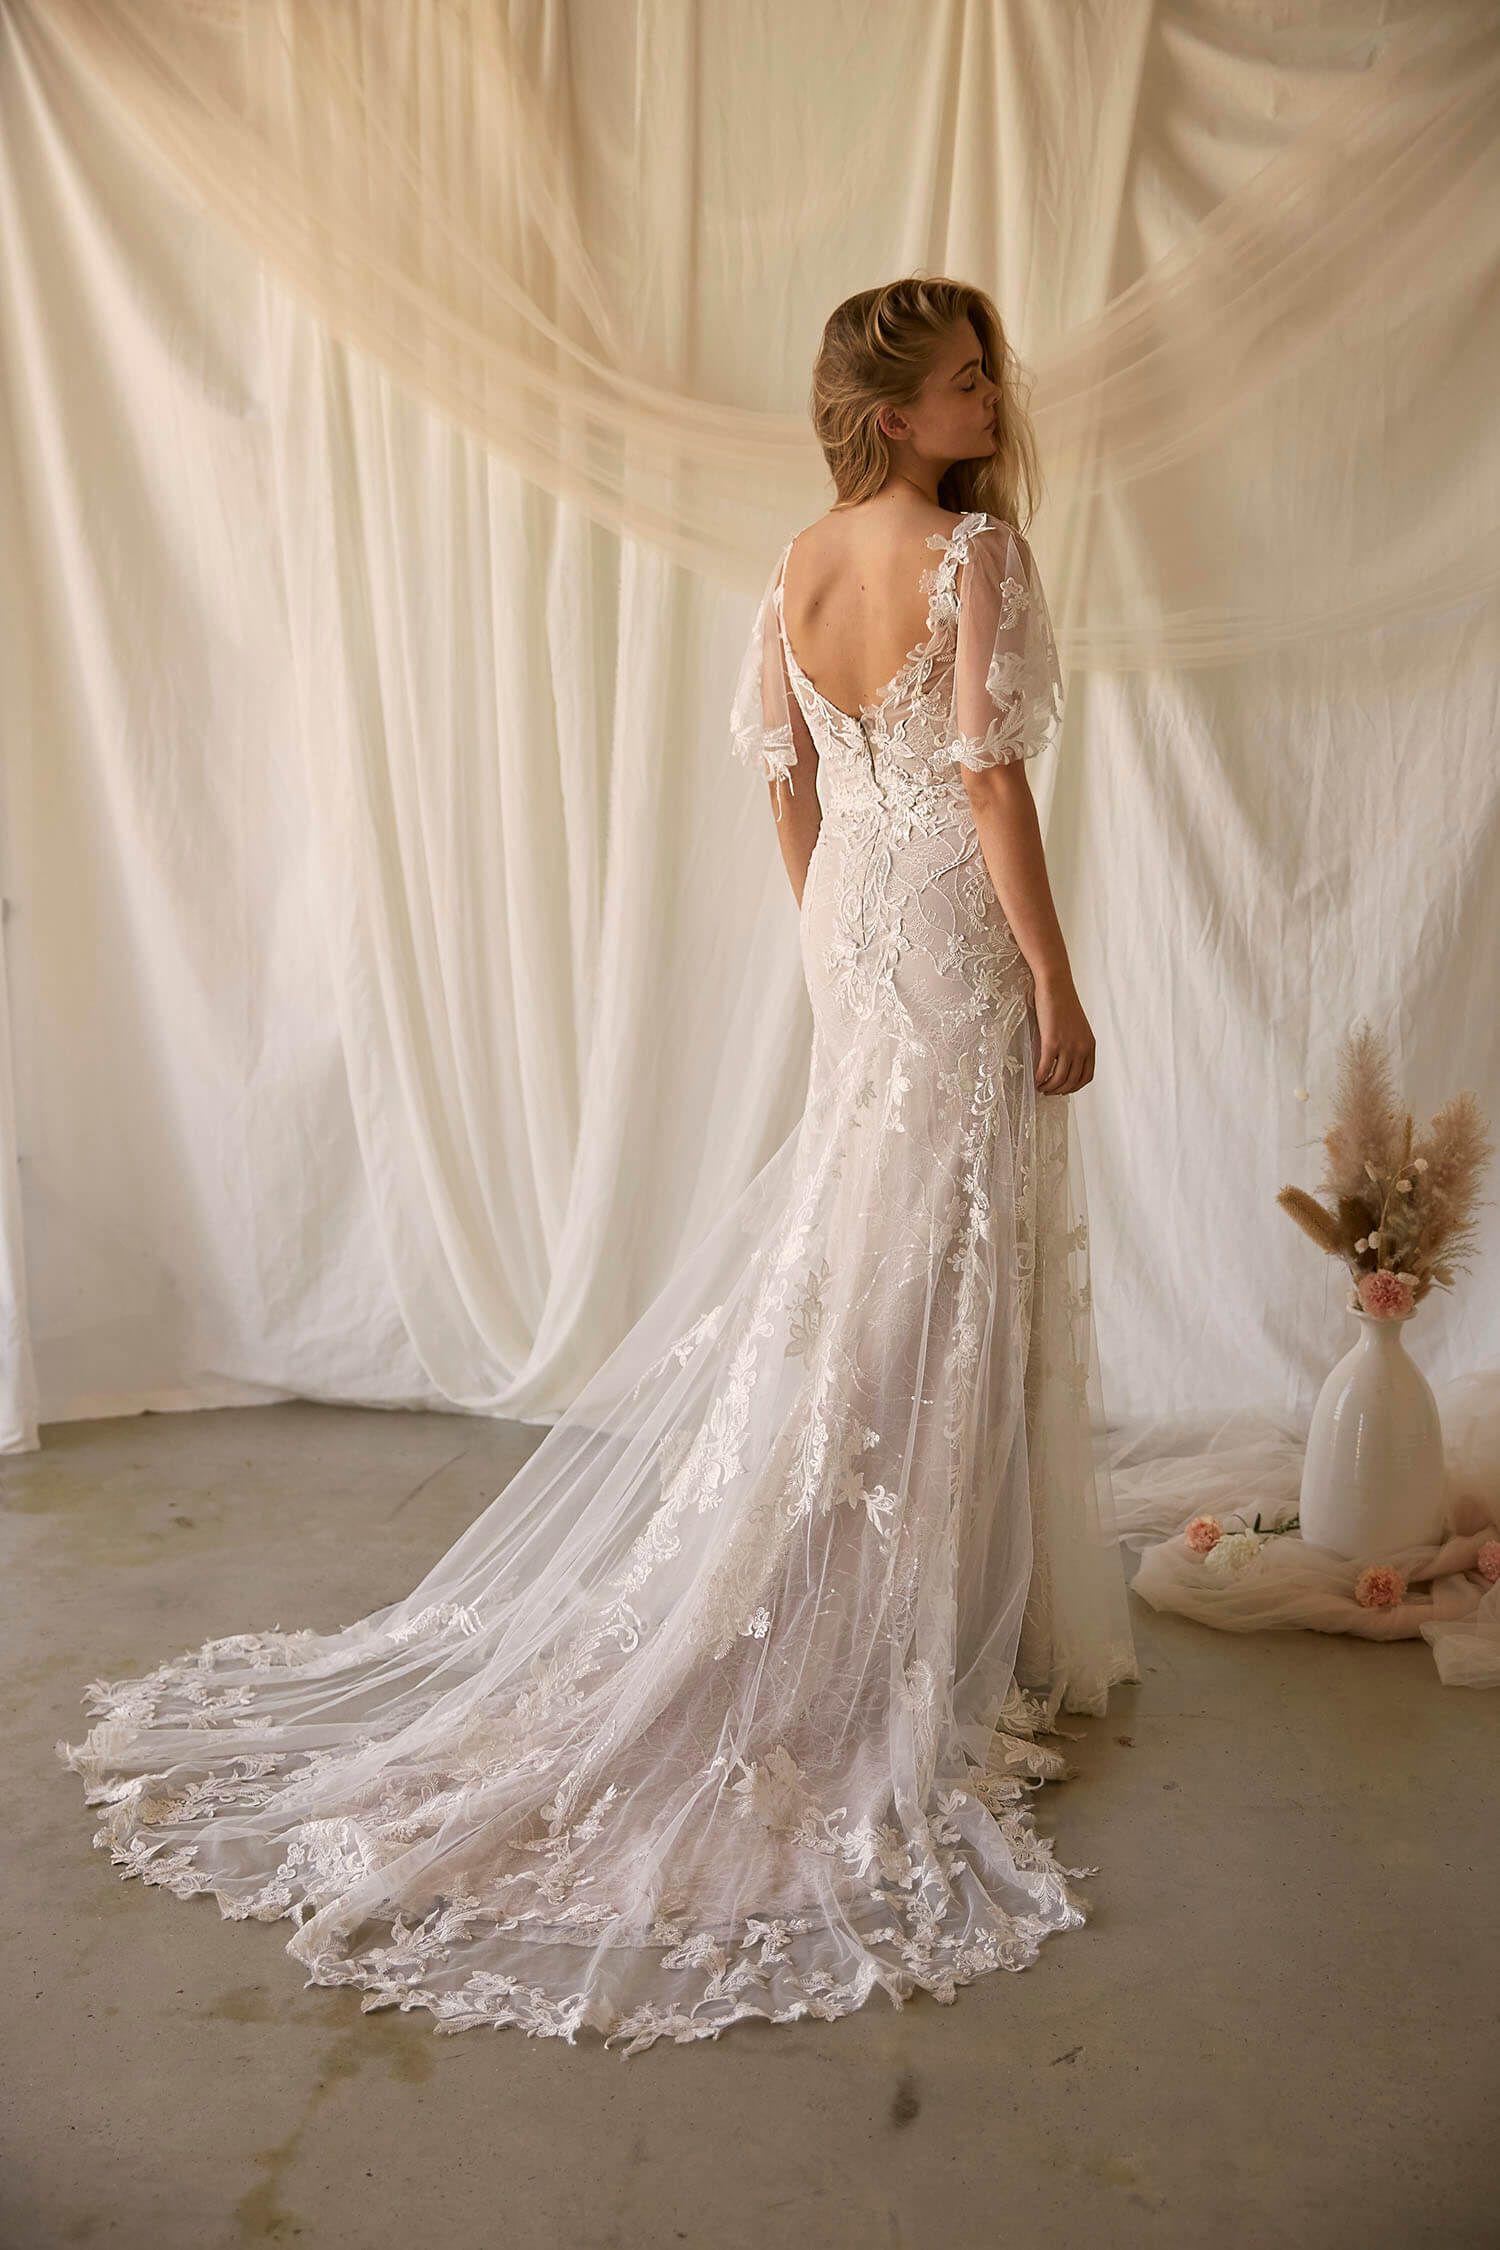 Almaj Bridal Auckland Wedding Dresses Bridal Shop In 2020 Older Bride Wedding Dress Bridal Dresses Ball Gown Wedding Dress